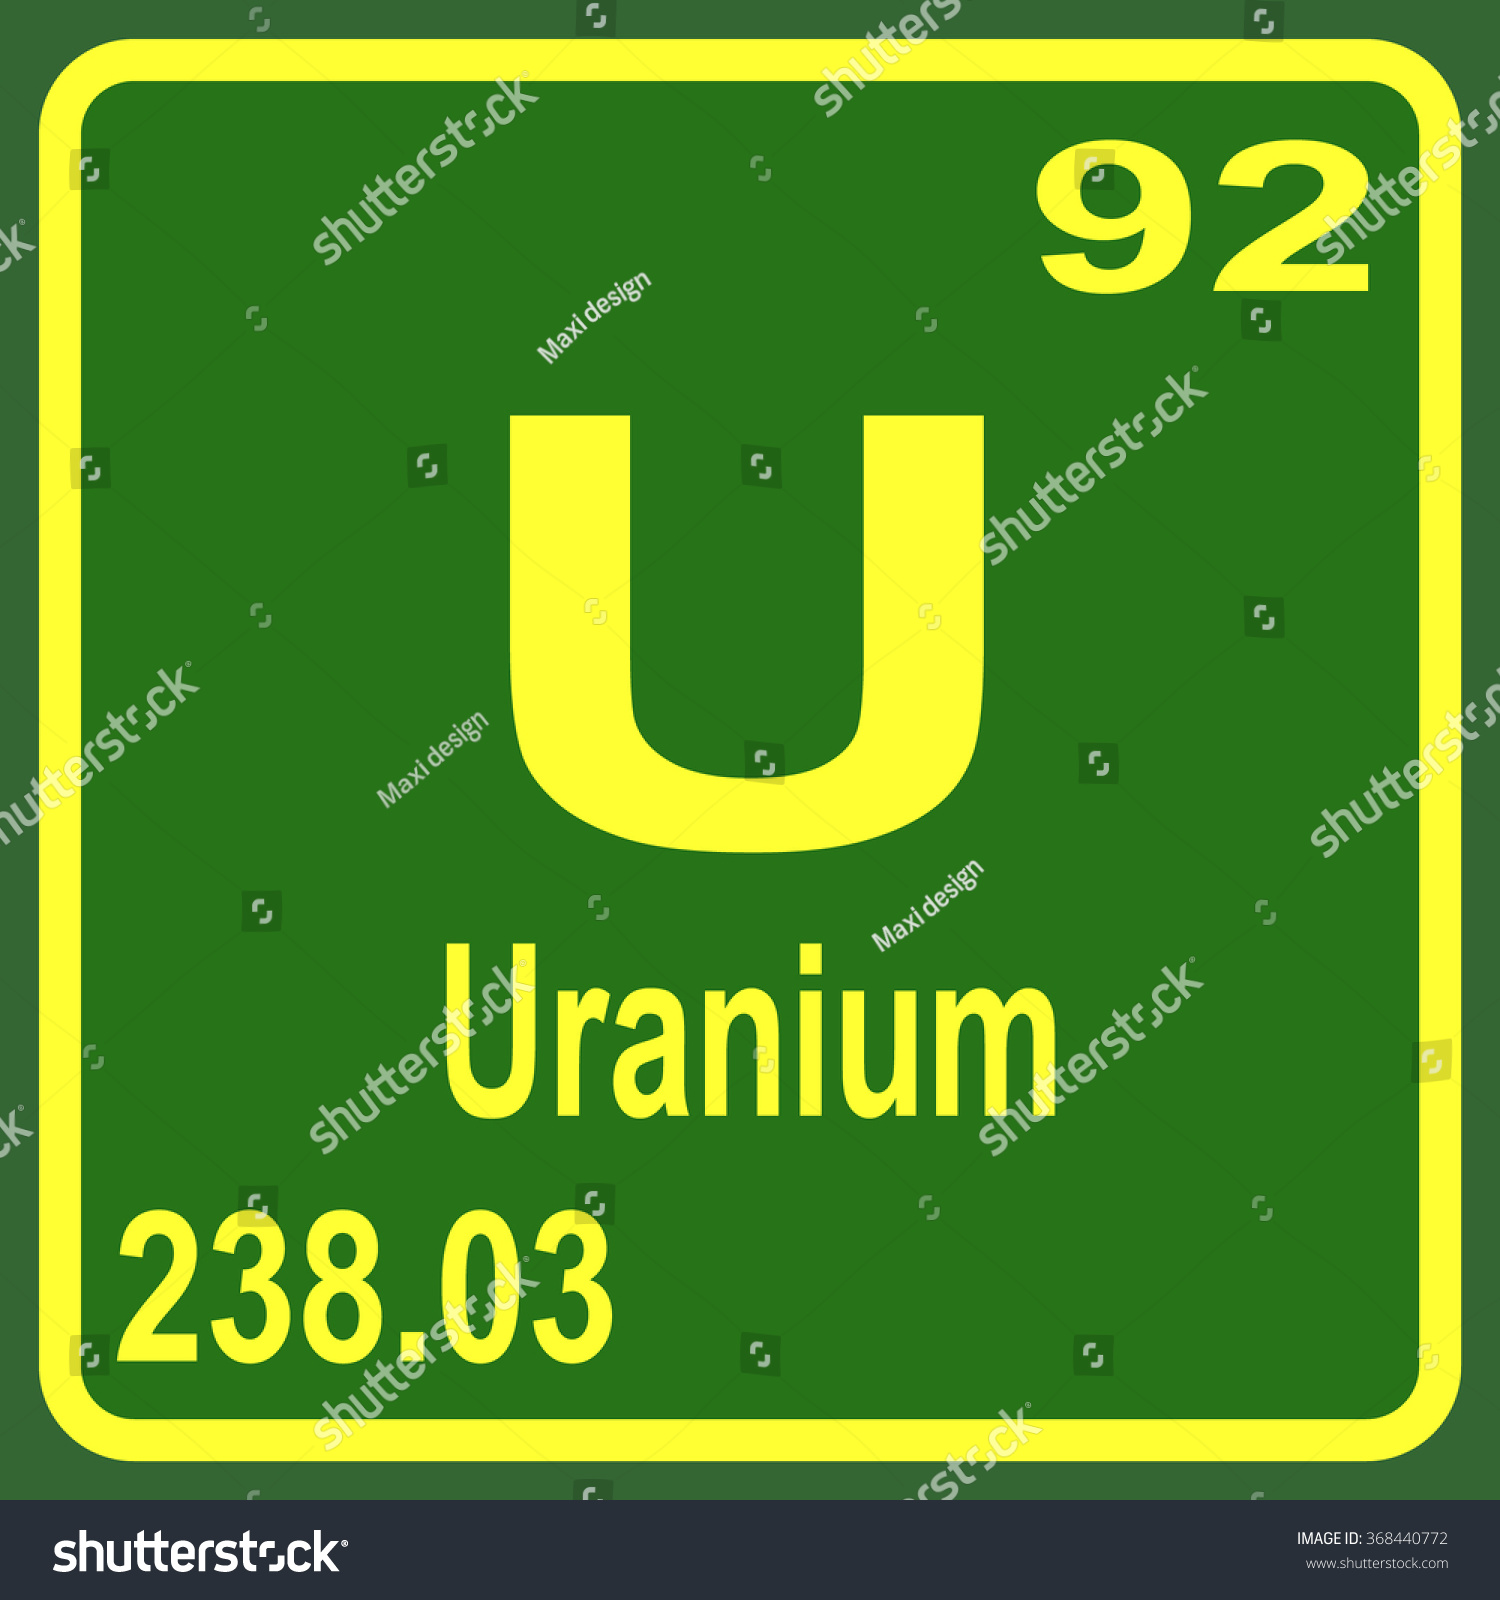 Periodic table elements uranium stock vector 368440772 shutterstock periodic table of elements uranium gamestrikefo Choice Image